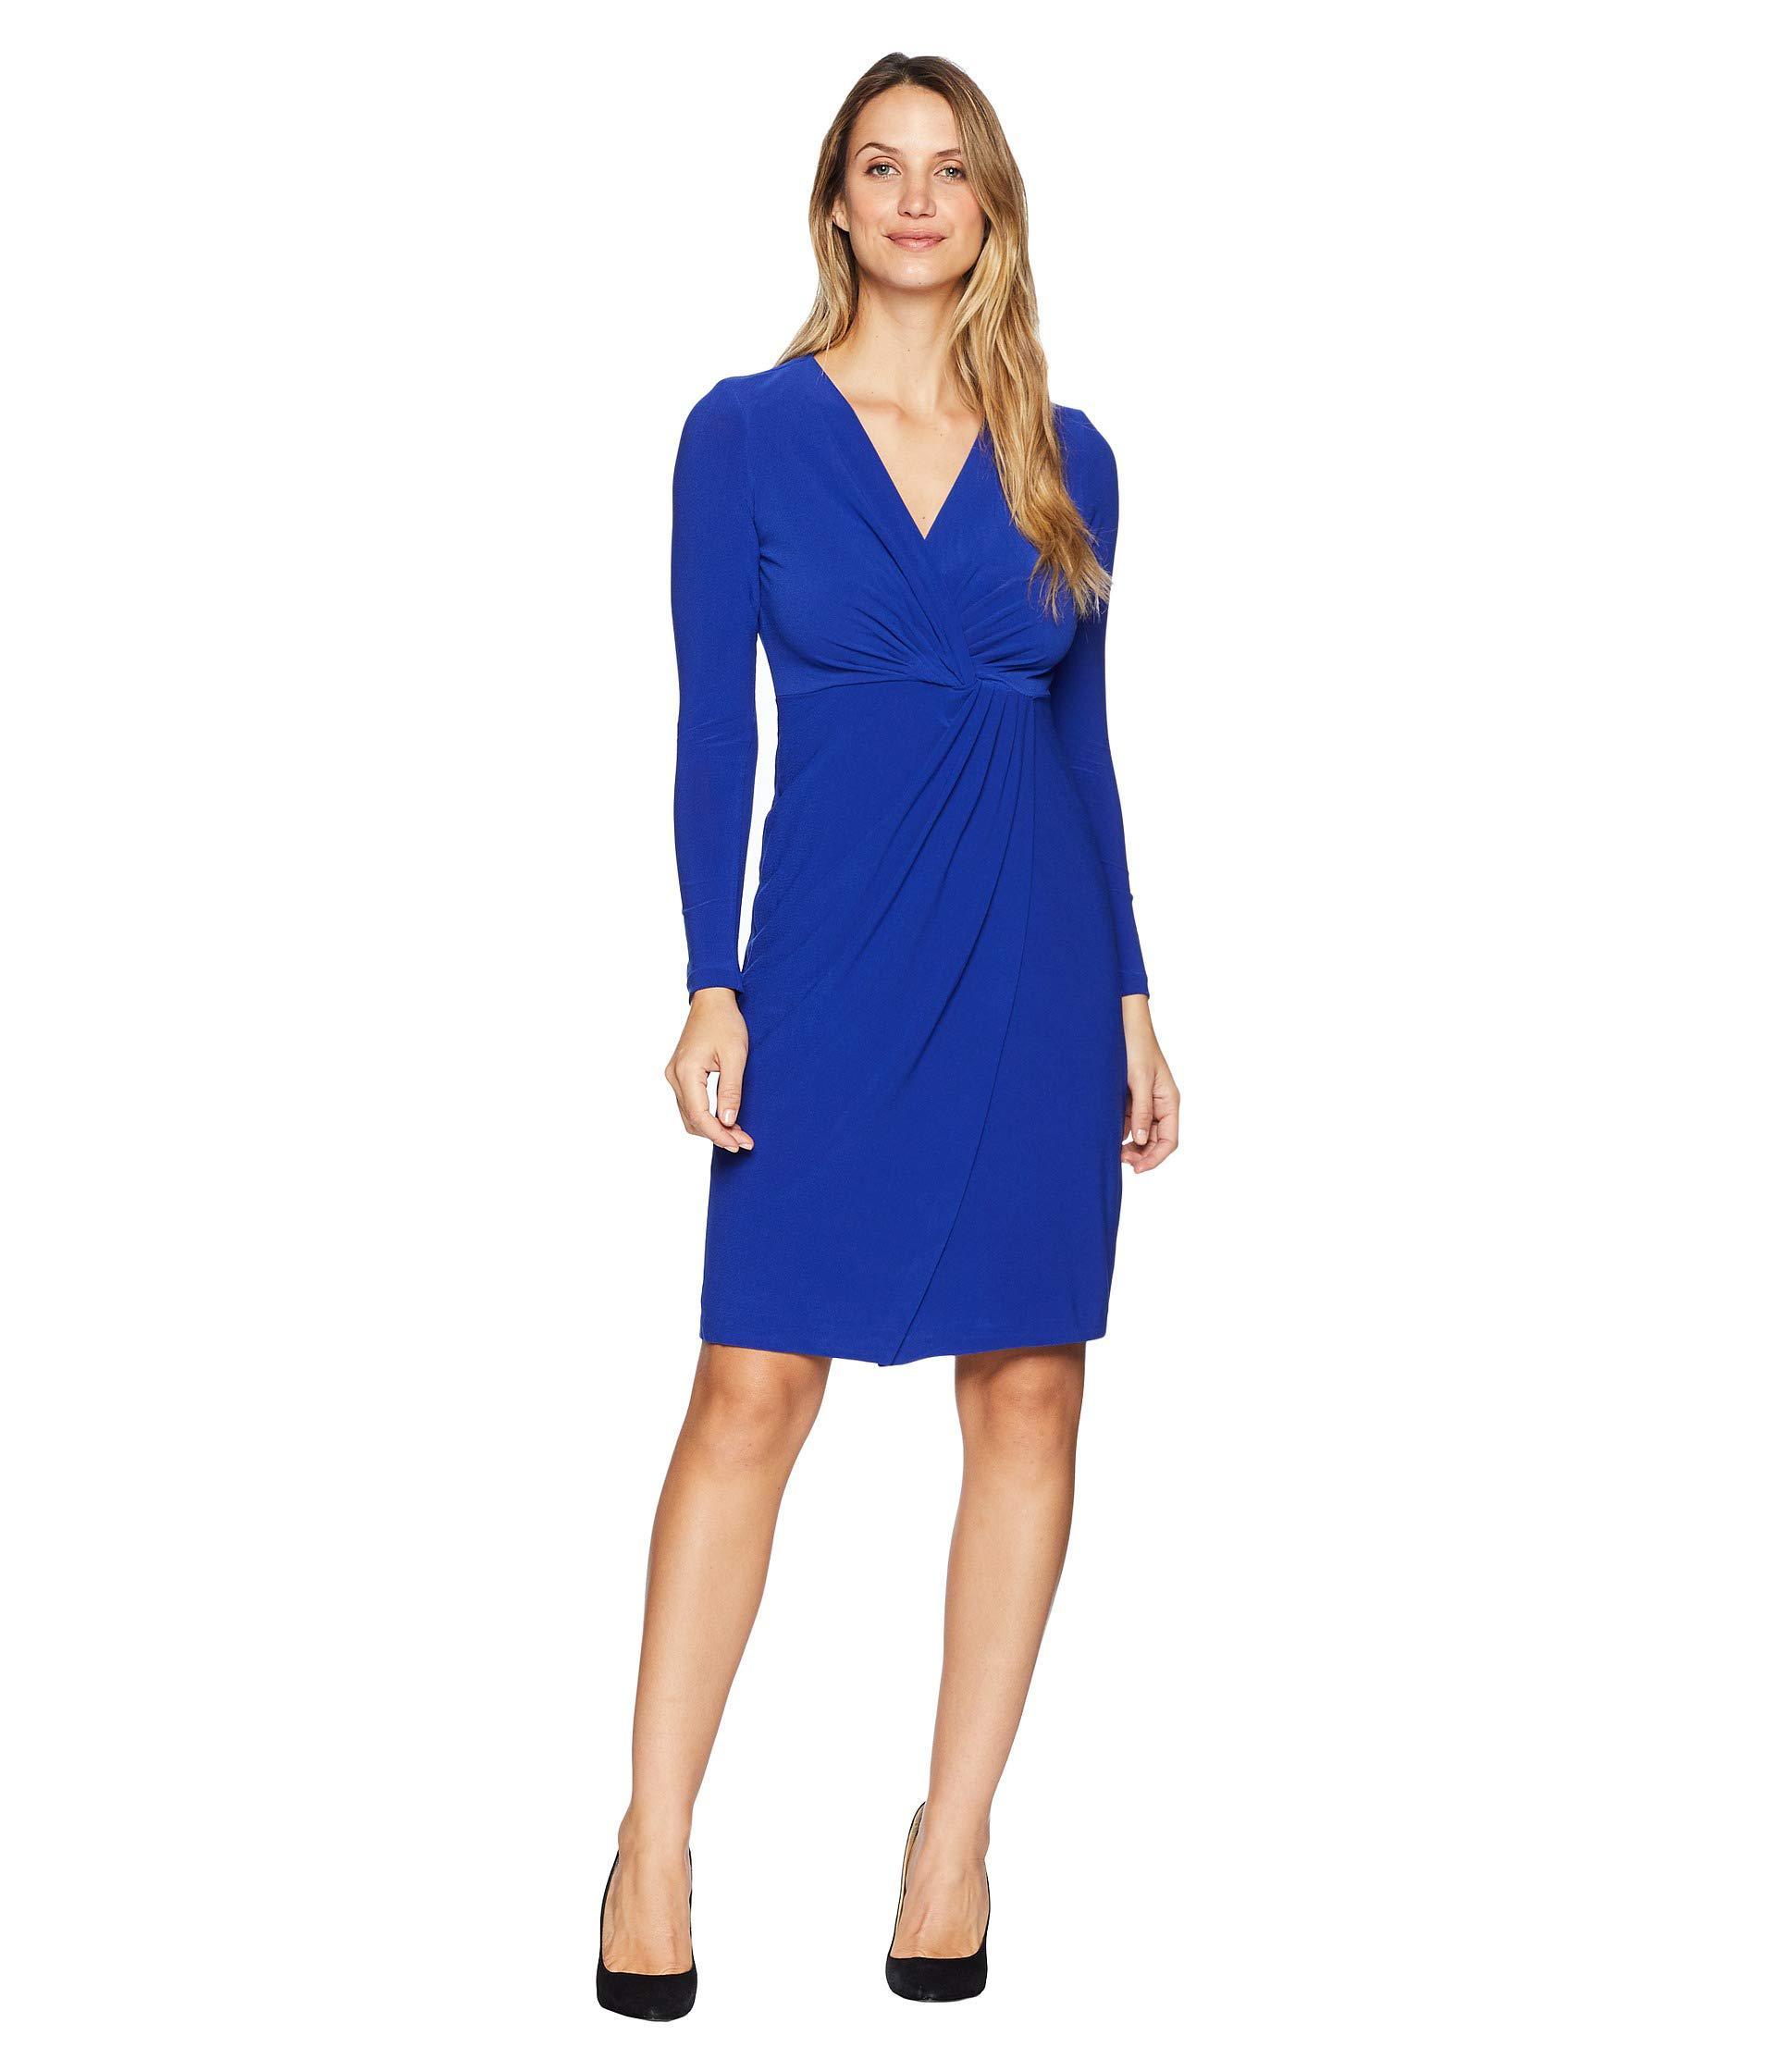 6c302b86 Lyst - Maggy London Crytal Crepe Wrap Dress (empire Blue) Women's ...